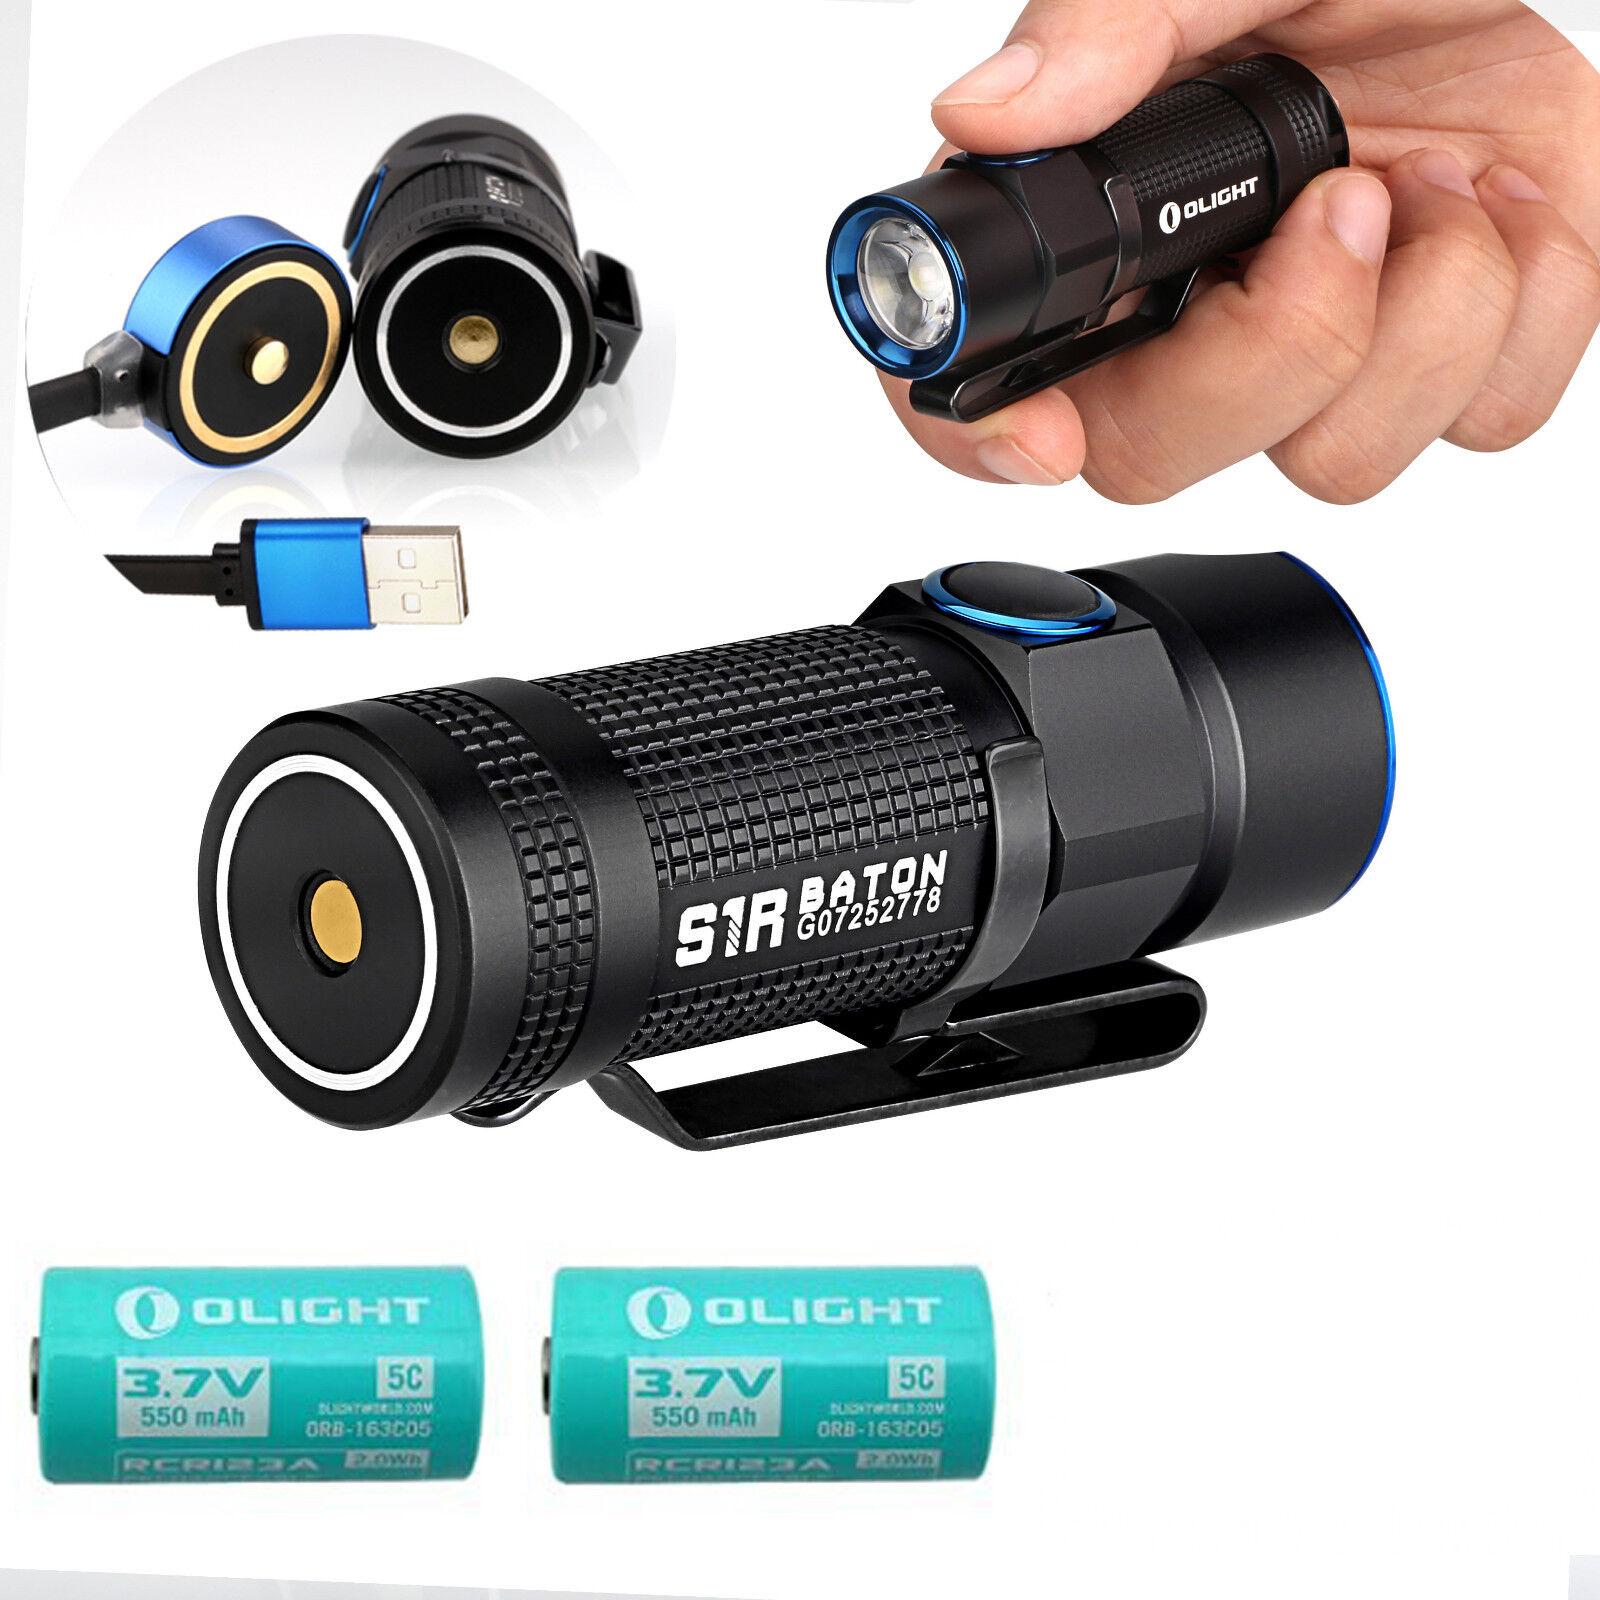 Olight S1R Baton 900Lumen USB Rechargeable  LED Flashlight Two RCR123 5C Battery  hottest new styles